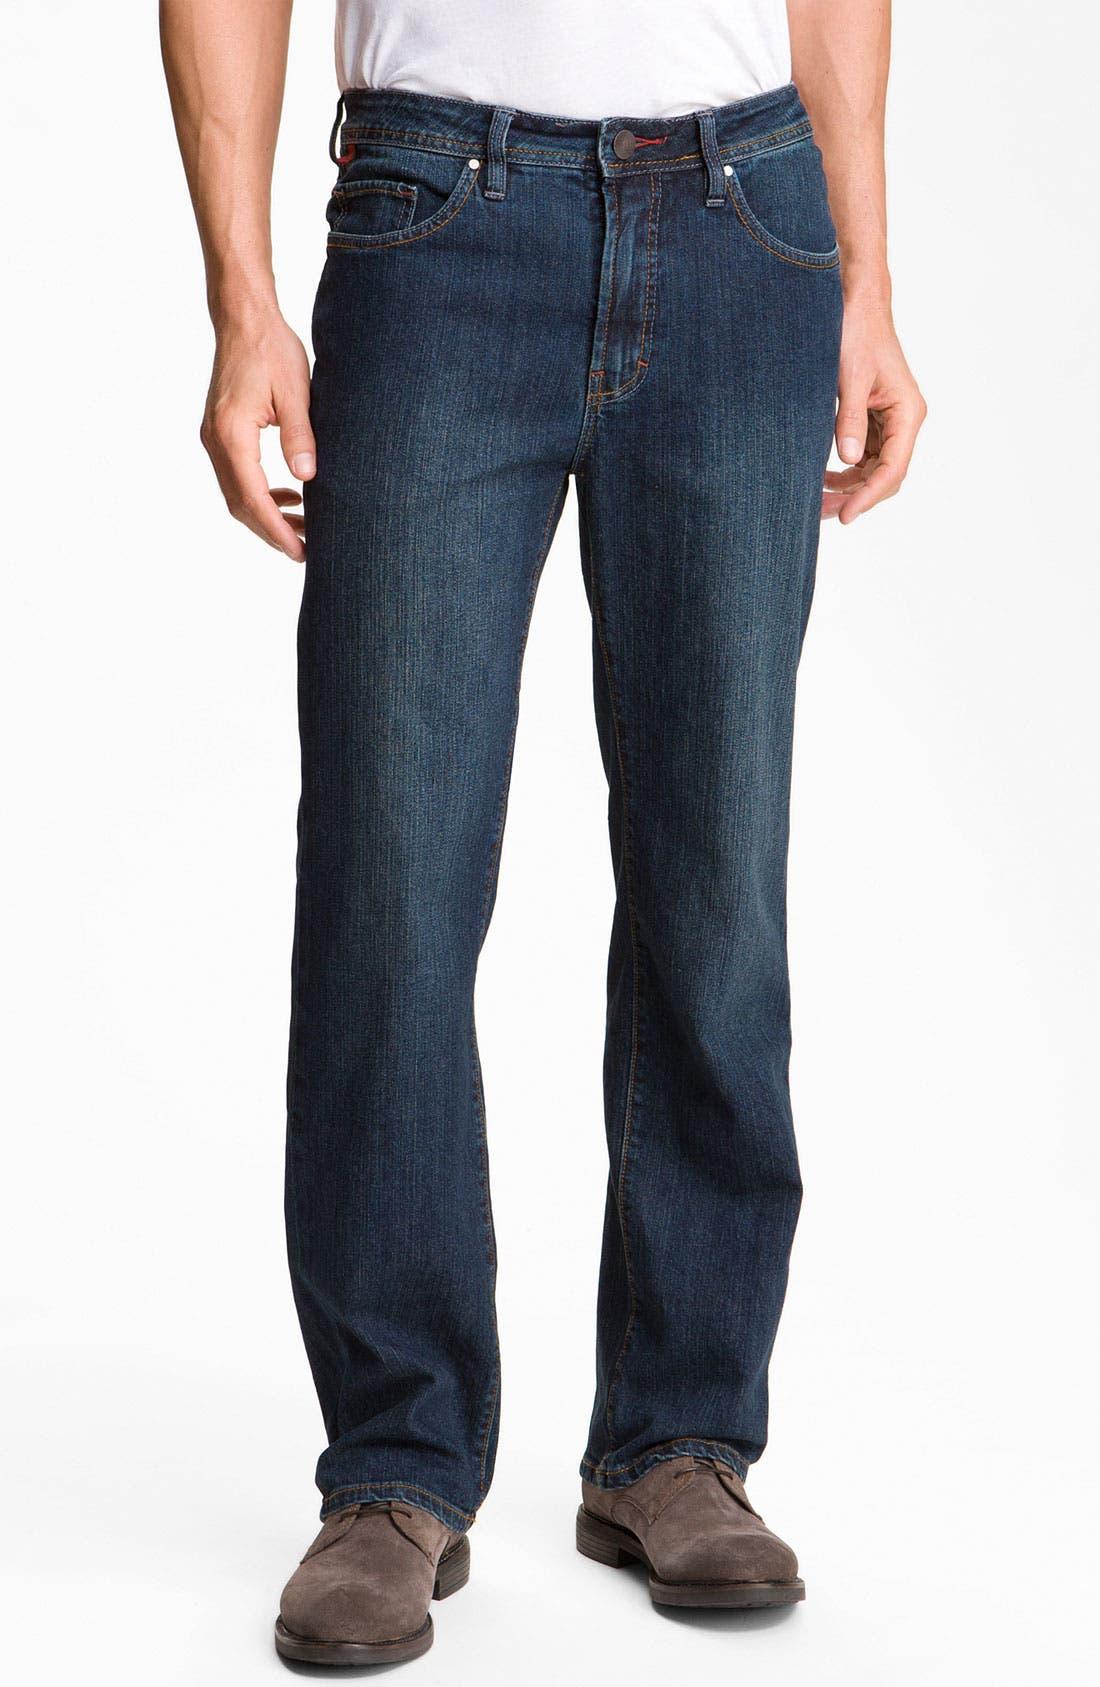 Alternate Image 1 Selected - Worn Jeans 'Octane' Straight Leg Jeans (Clean Dark)